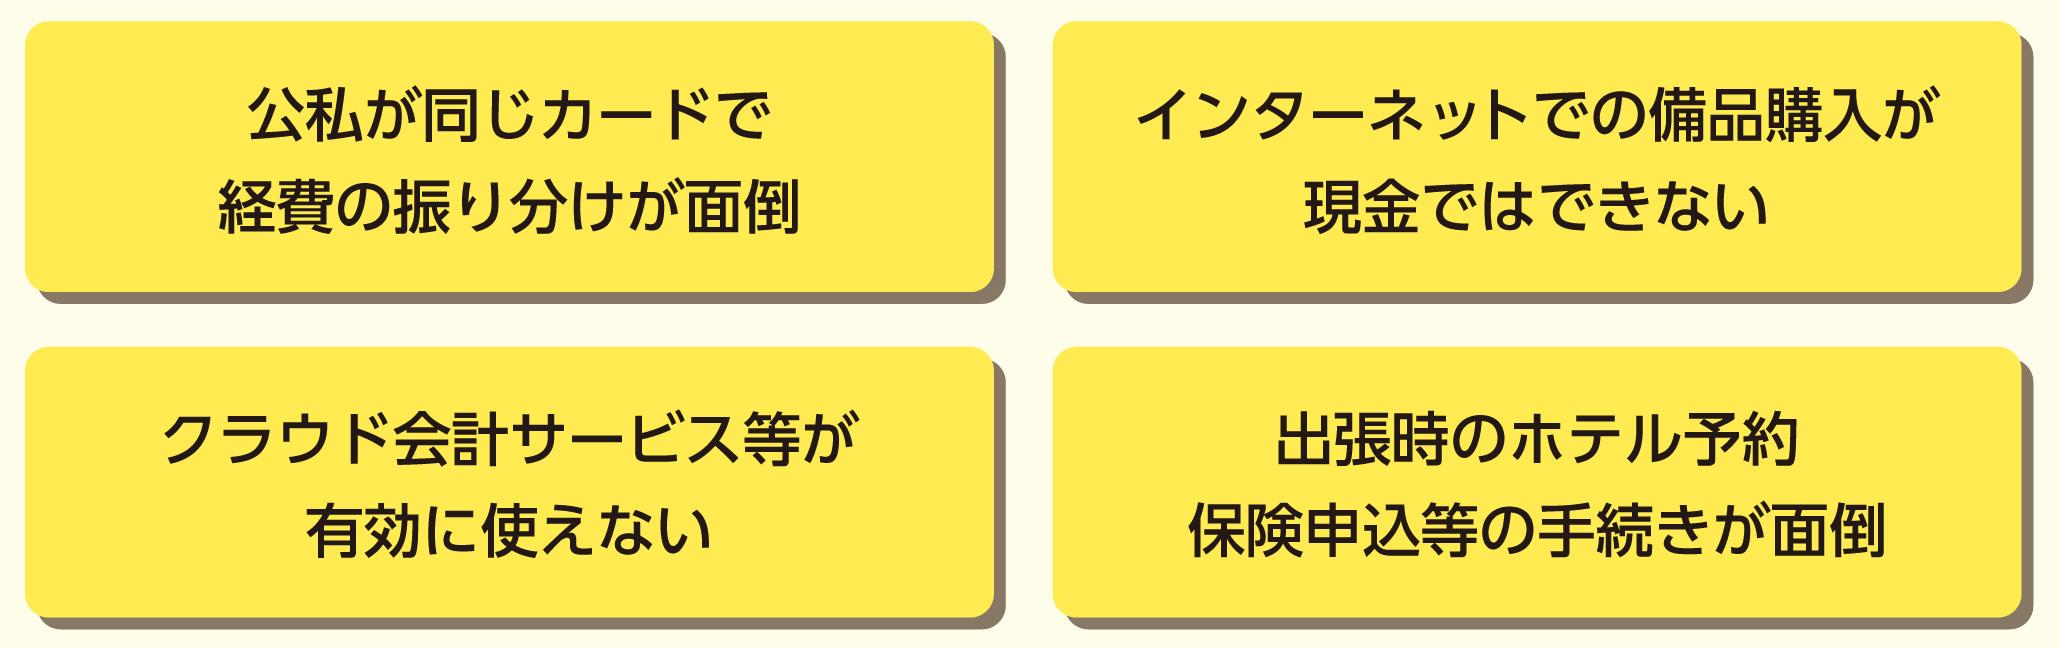 TieUP_MitsuisumitomoCARD_0125